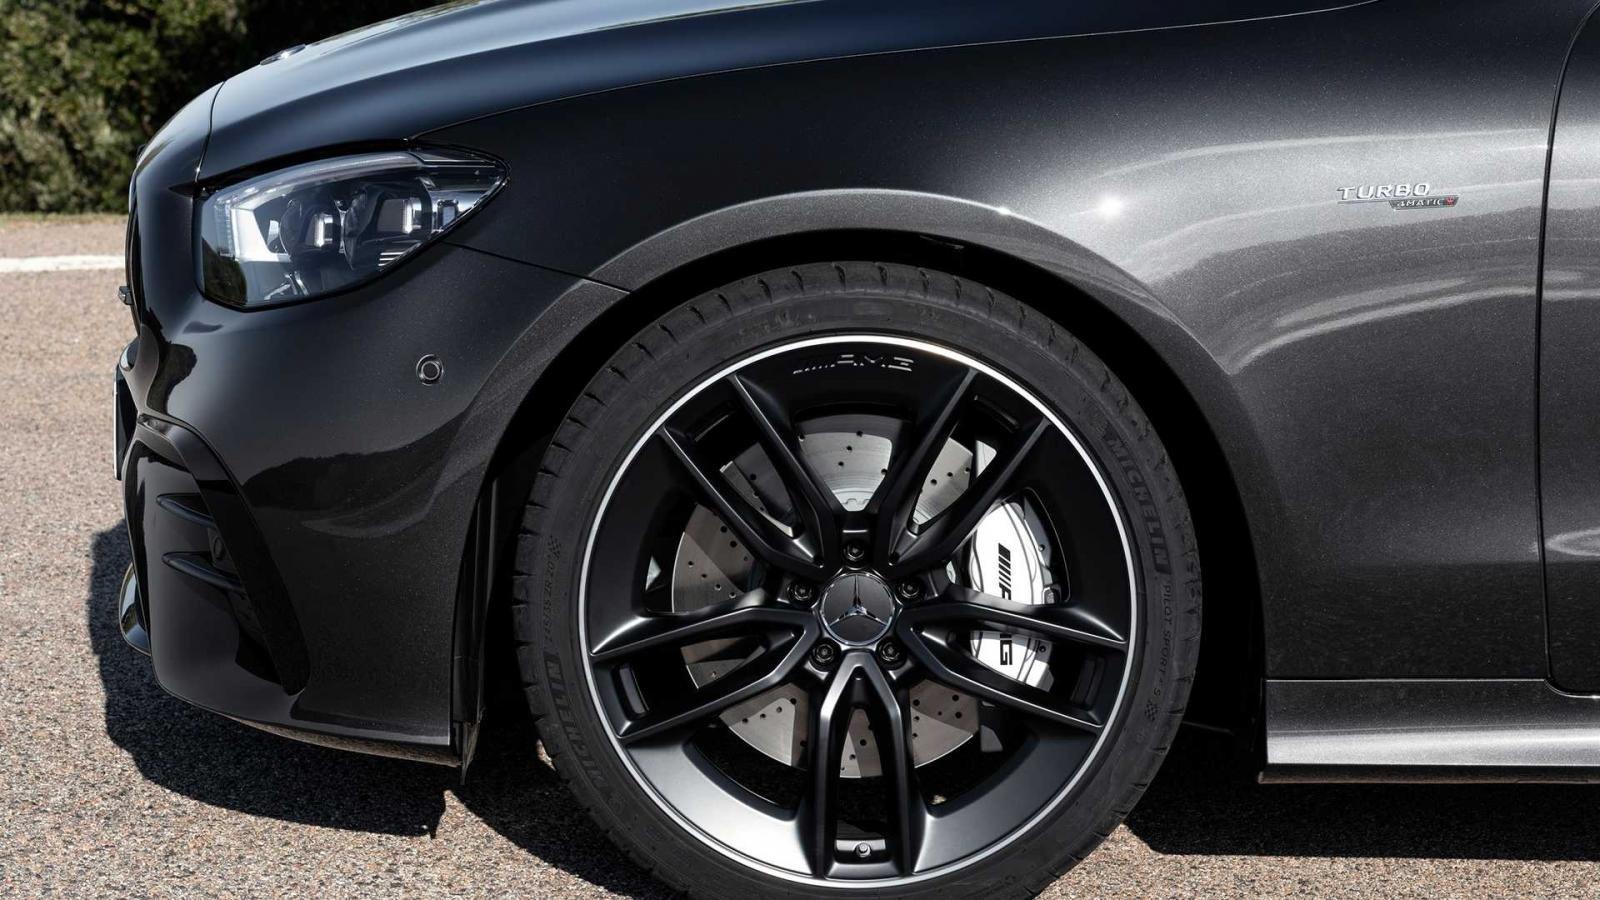 mercedes amg e53 coupe va cabriolet 2021 trinh lan aad7